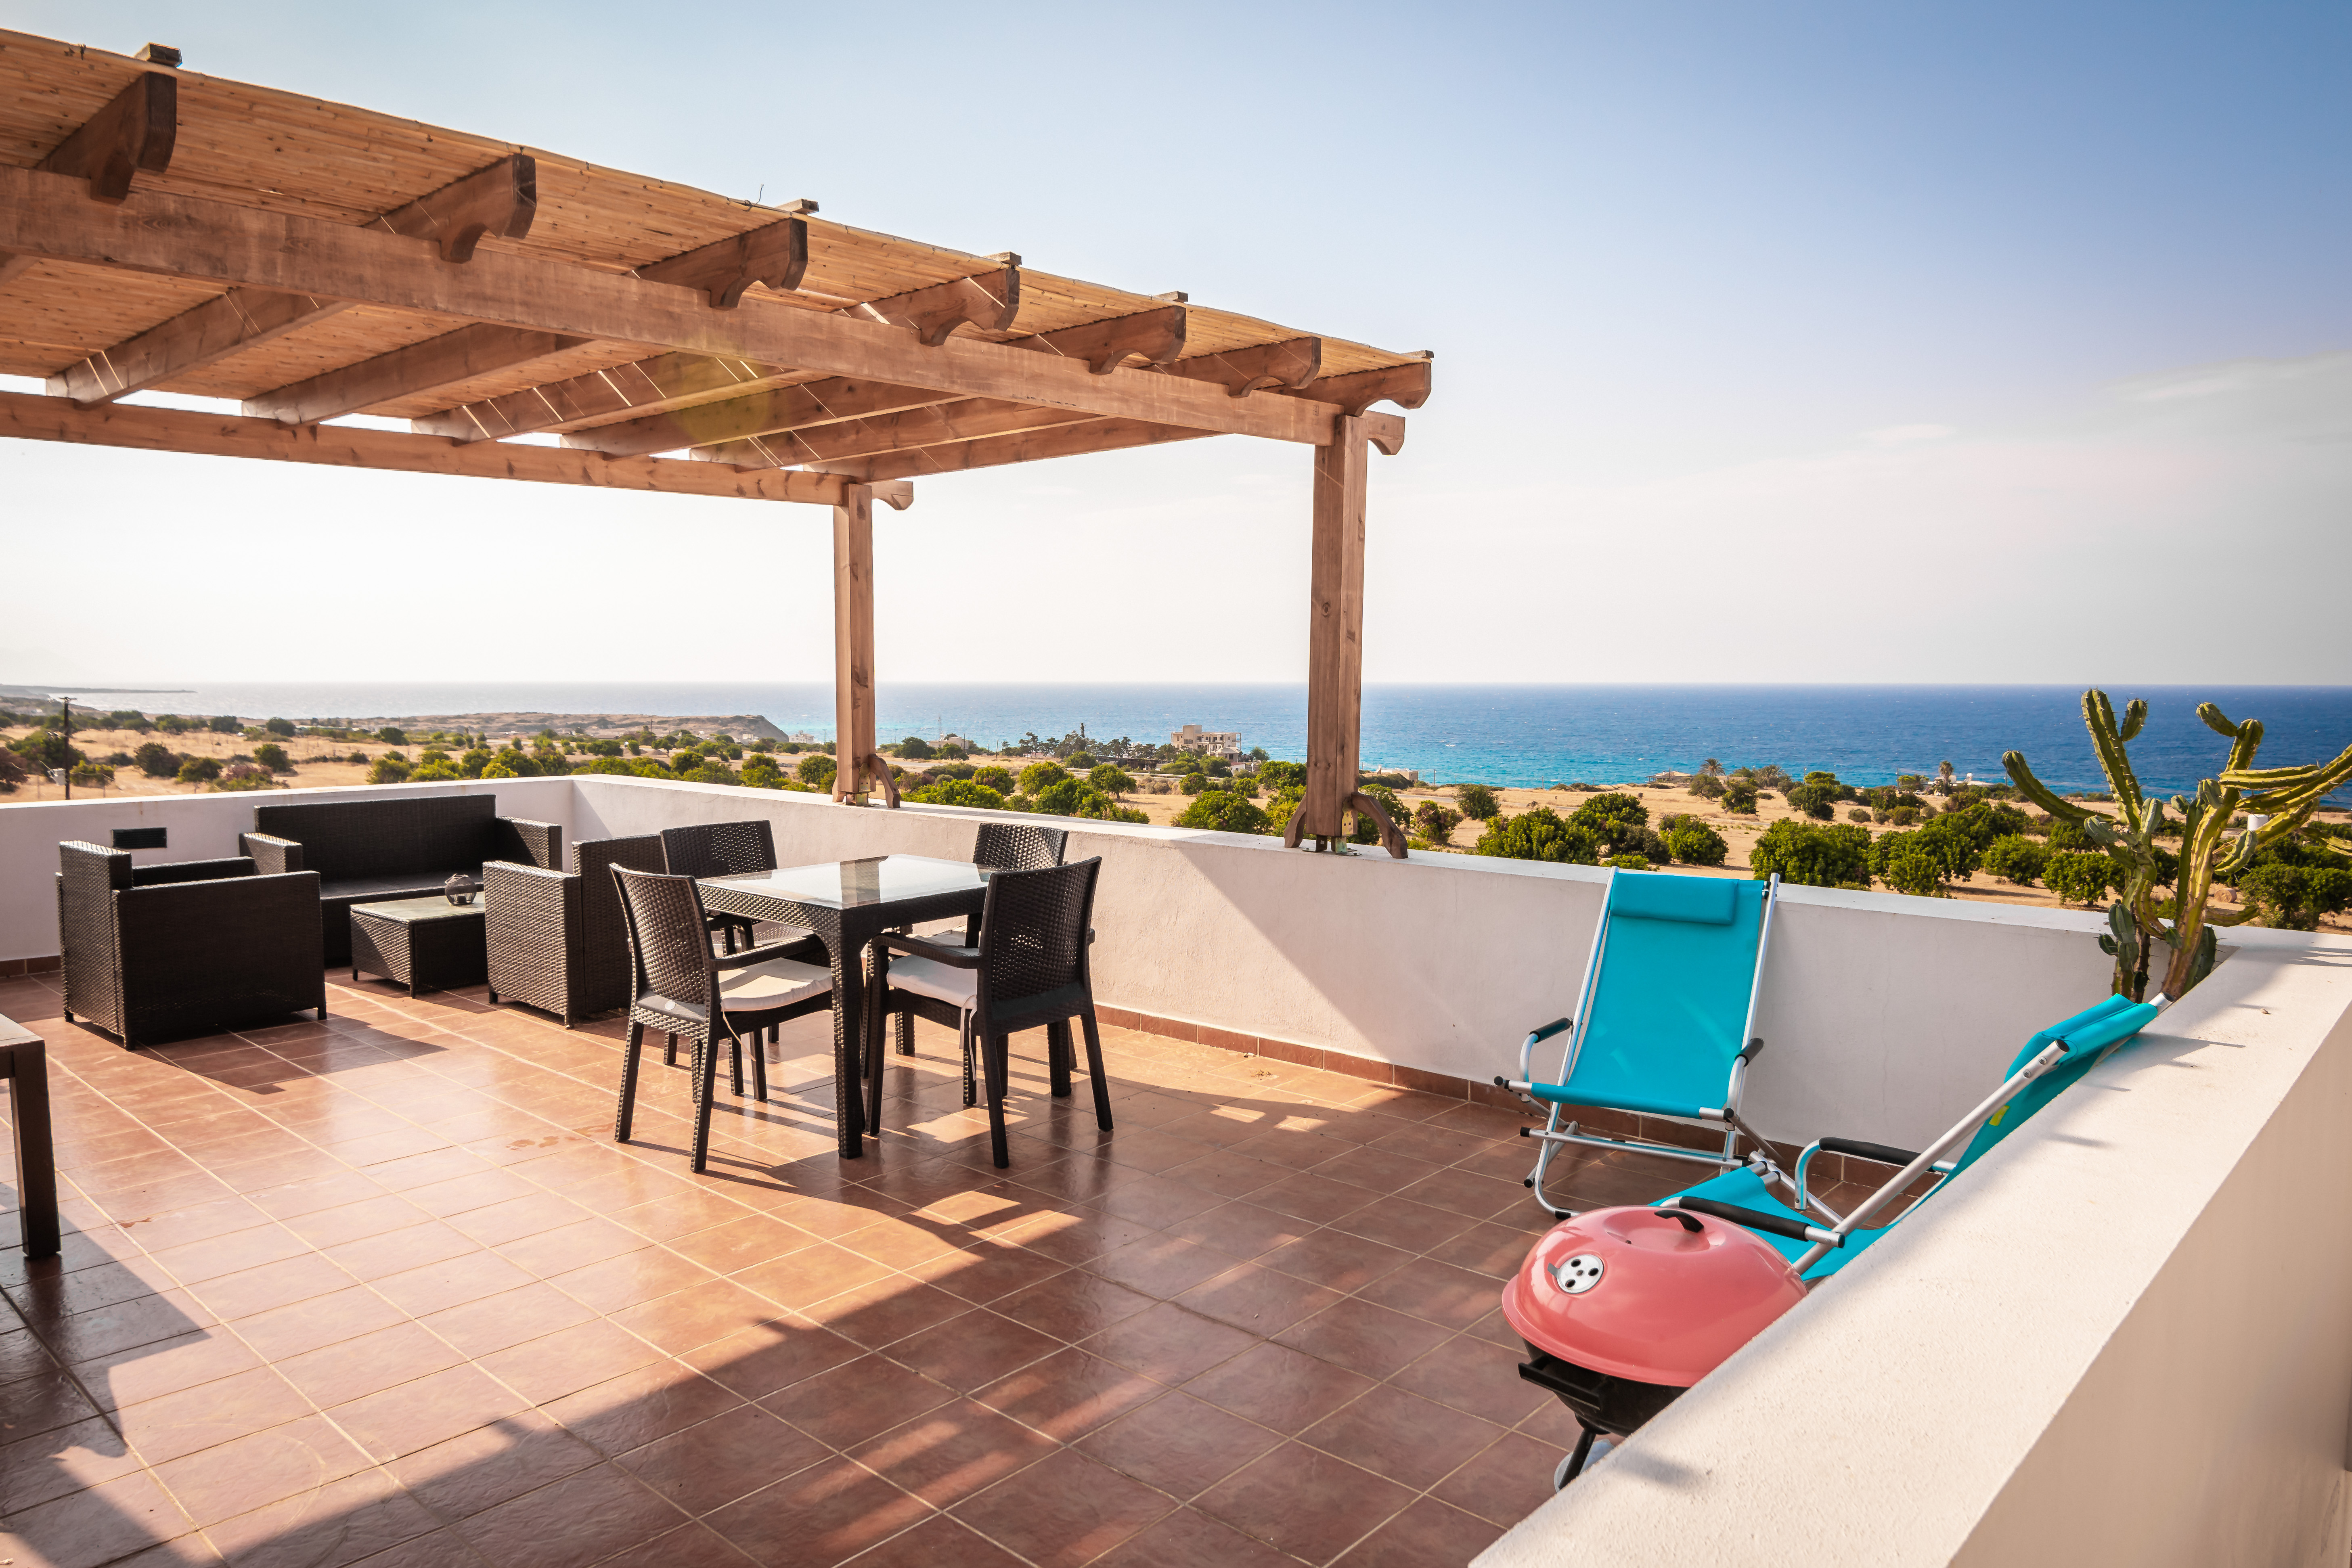 Apartment Joya Cyprus Manzara Penthouse Apartment photo 19787645